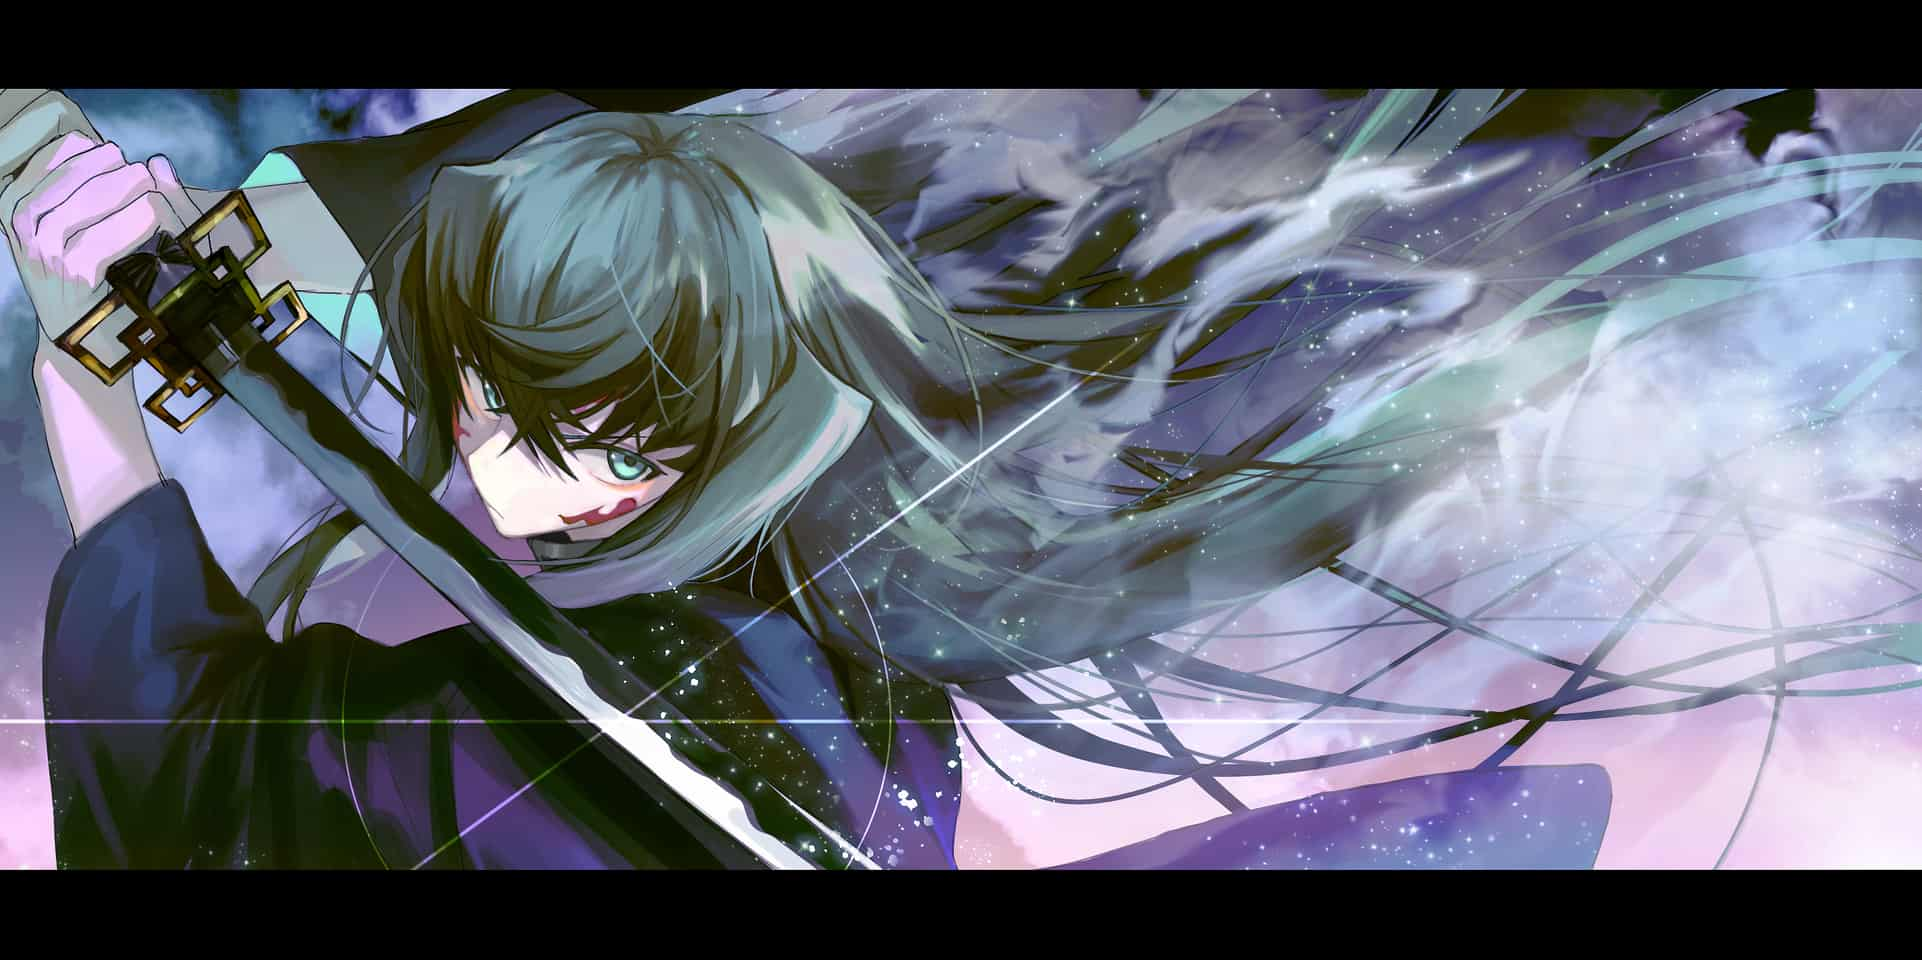 霞の呼吸 Illust of :/XUEFEI DemonSlayerFanartContest KimetsunoYaiba TokitouMuichirou